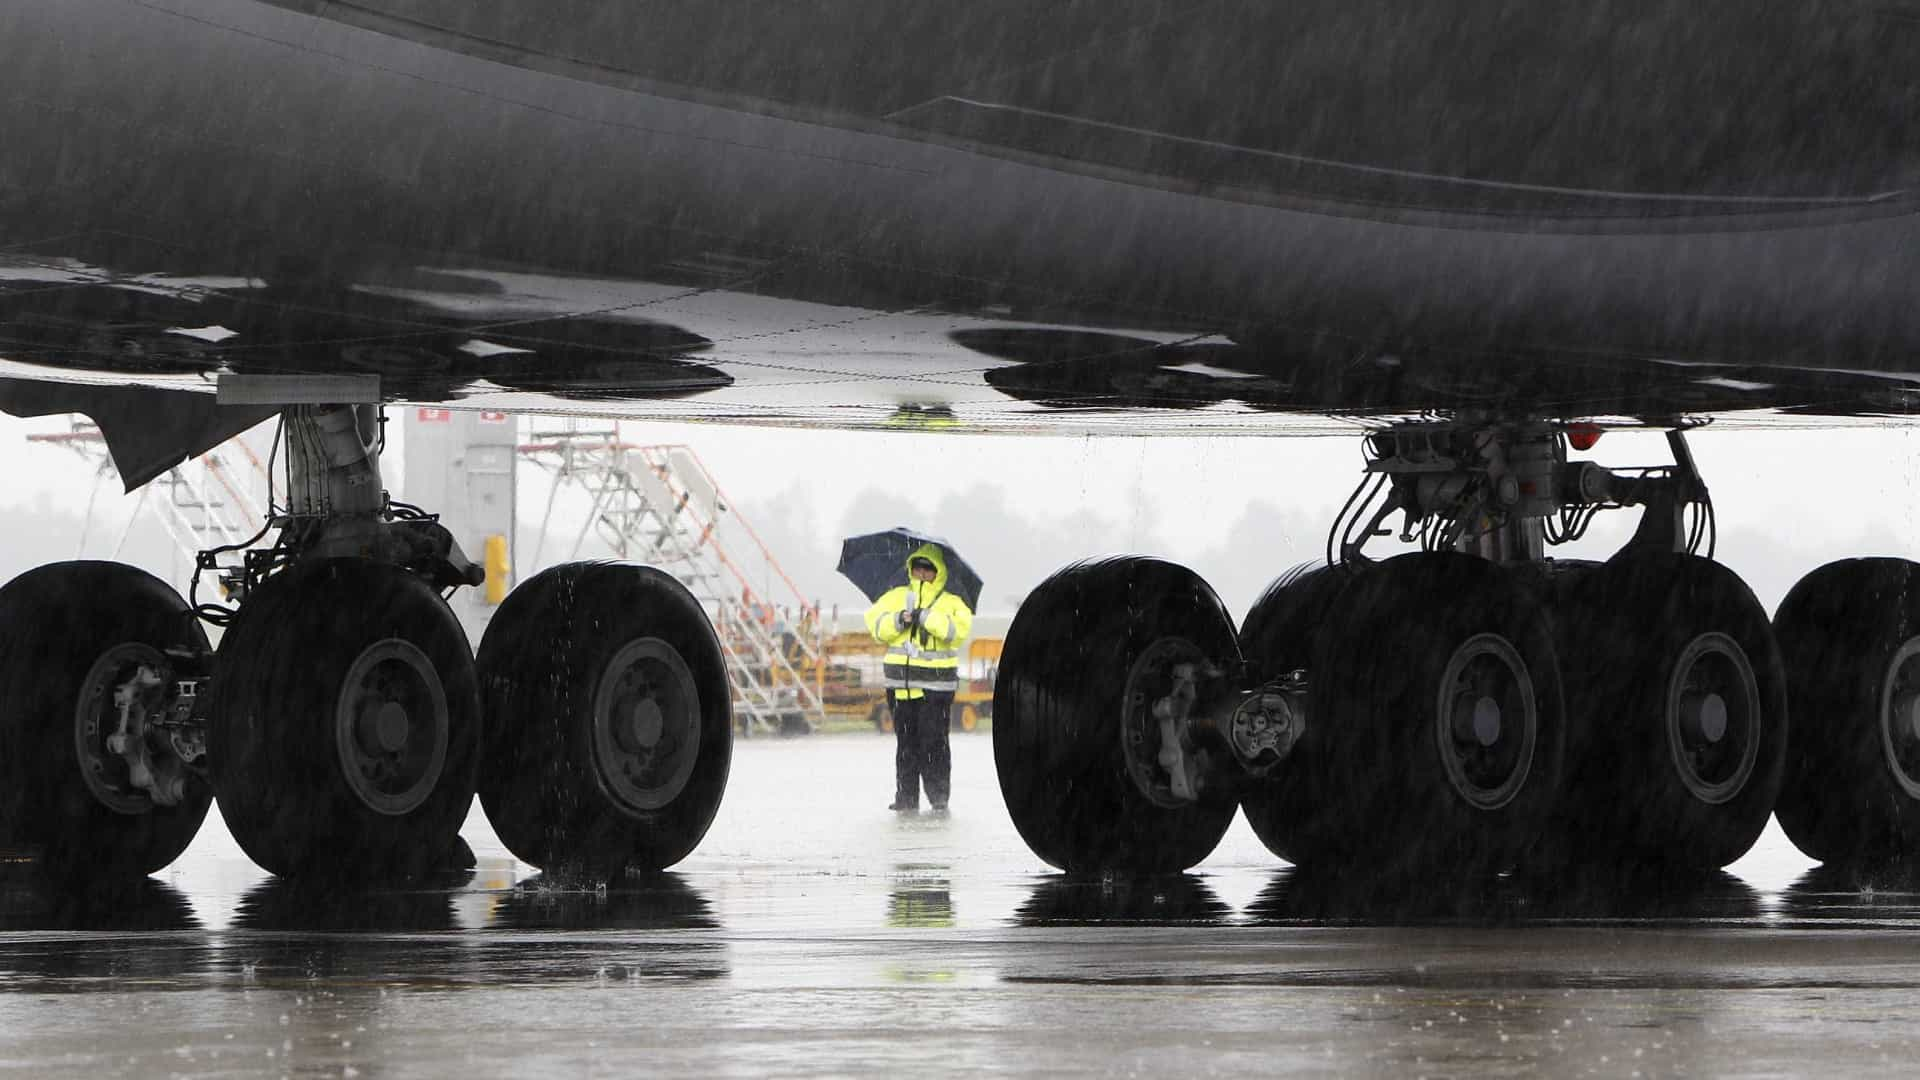 Aeroporto Dili : Notícias ao minuto voo singapura dili partiu de makassar após